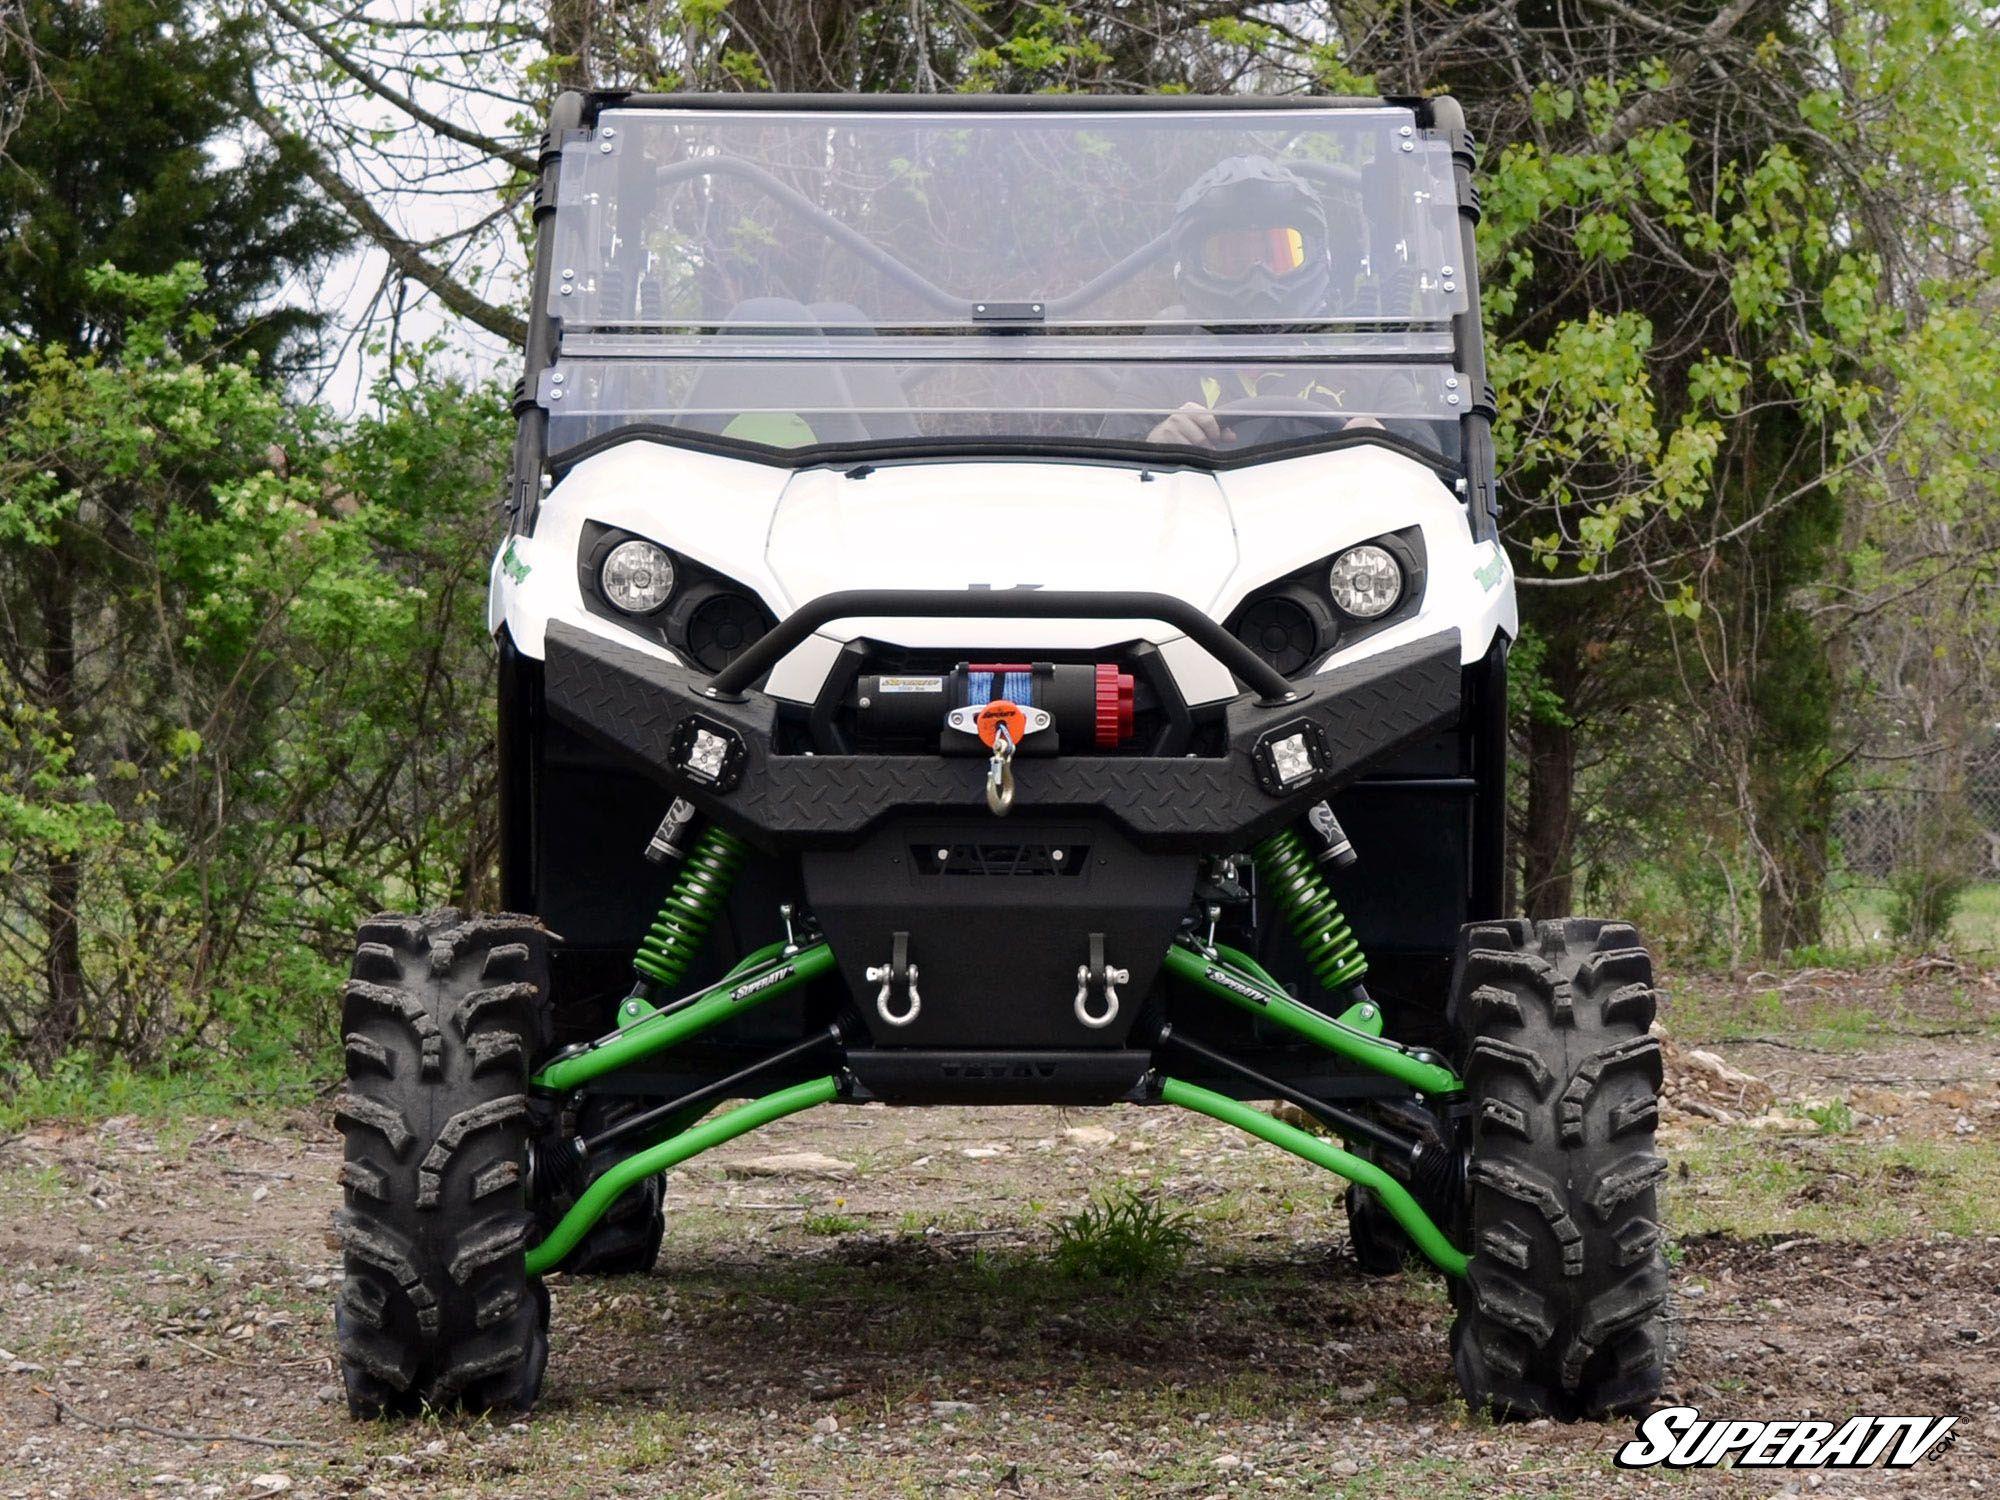 Super Atv Kawasaki Teryx Diamond Plate Front Bumper